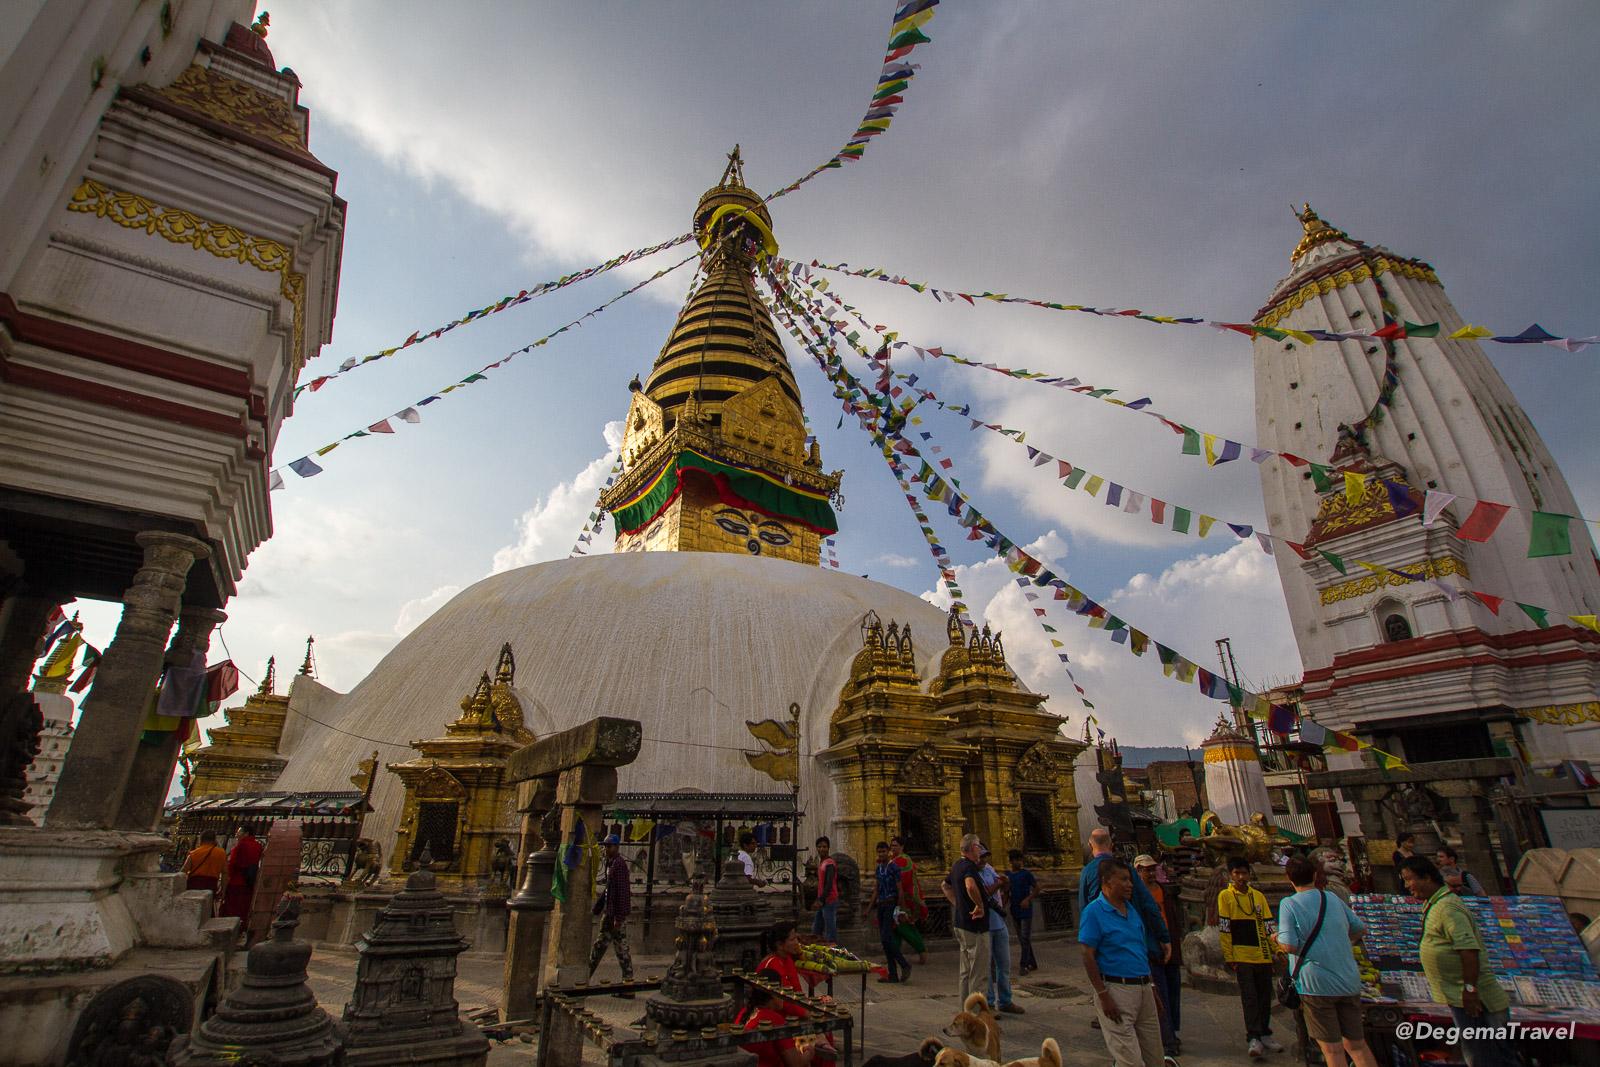 Swayambhu Temple in Kathmandu, Nepal